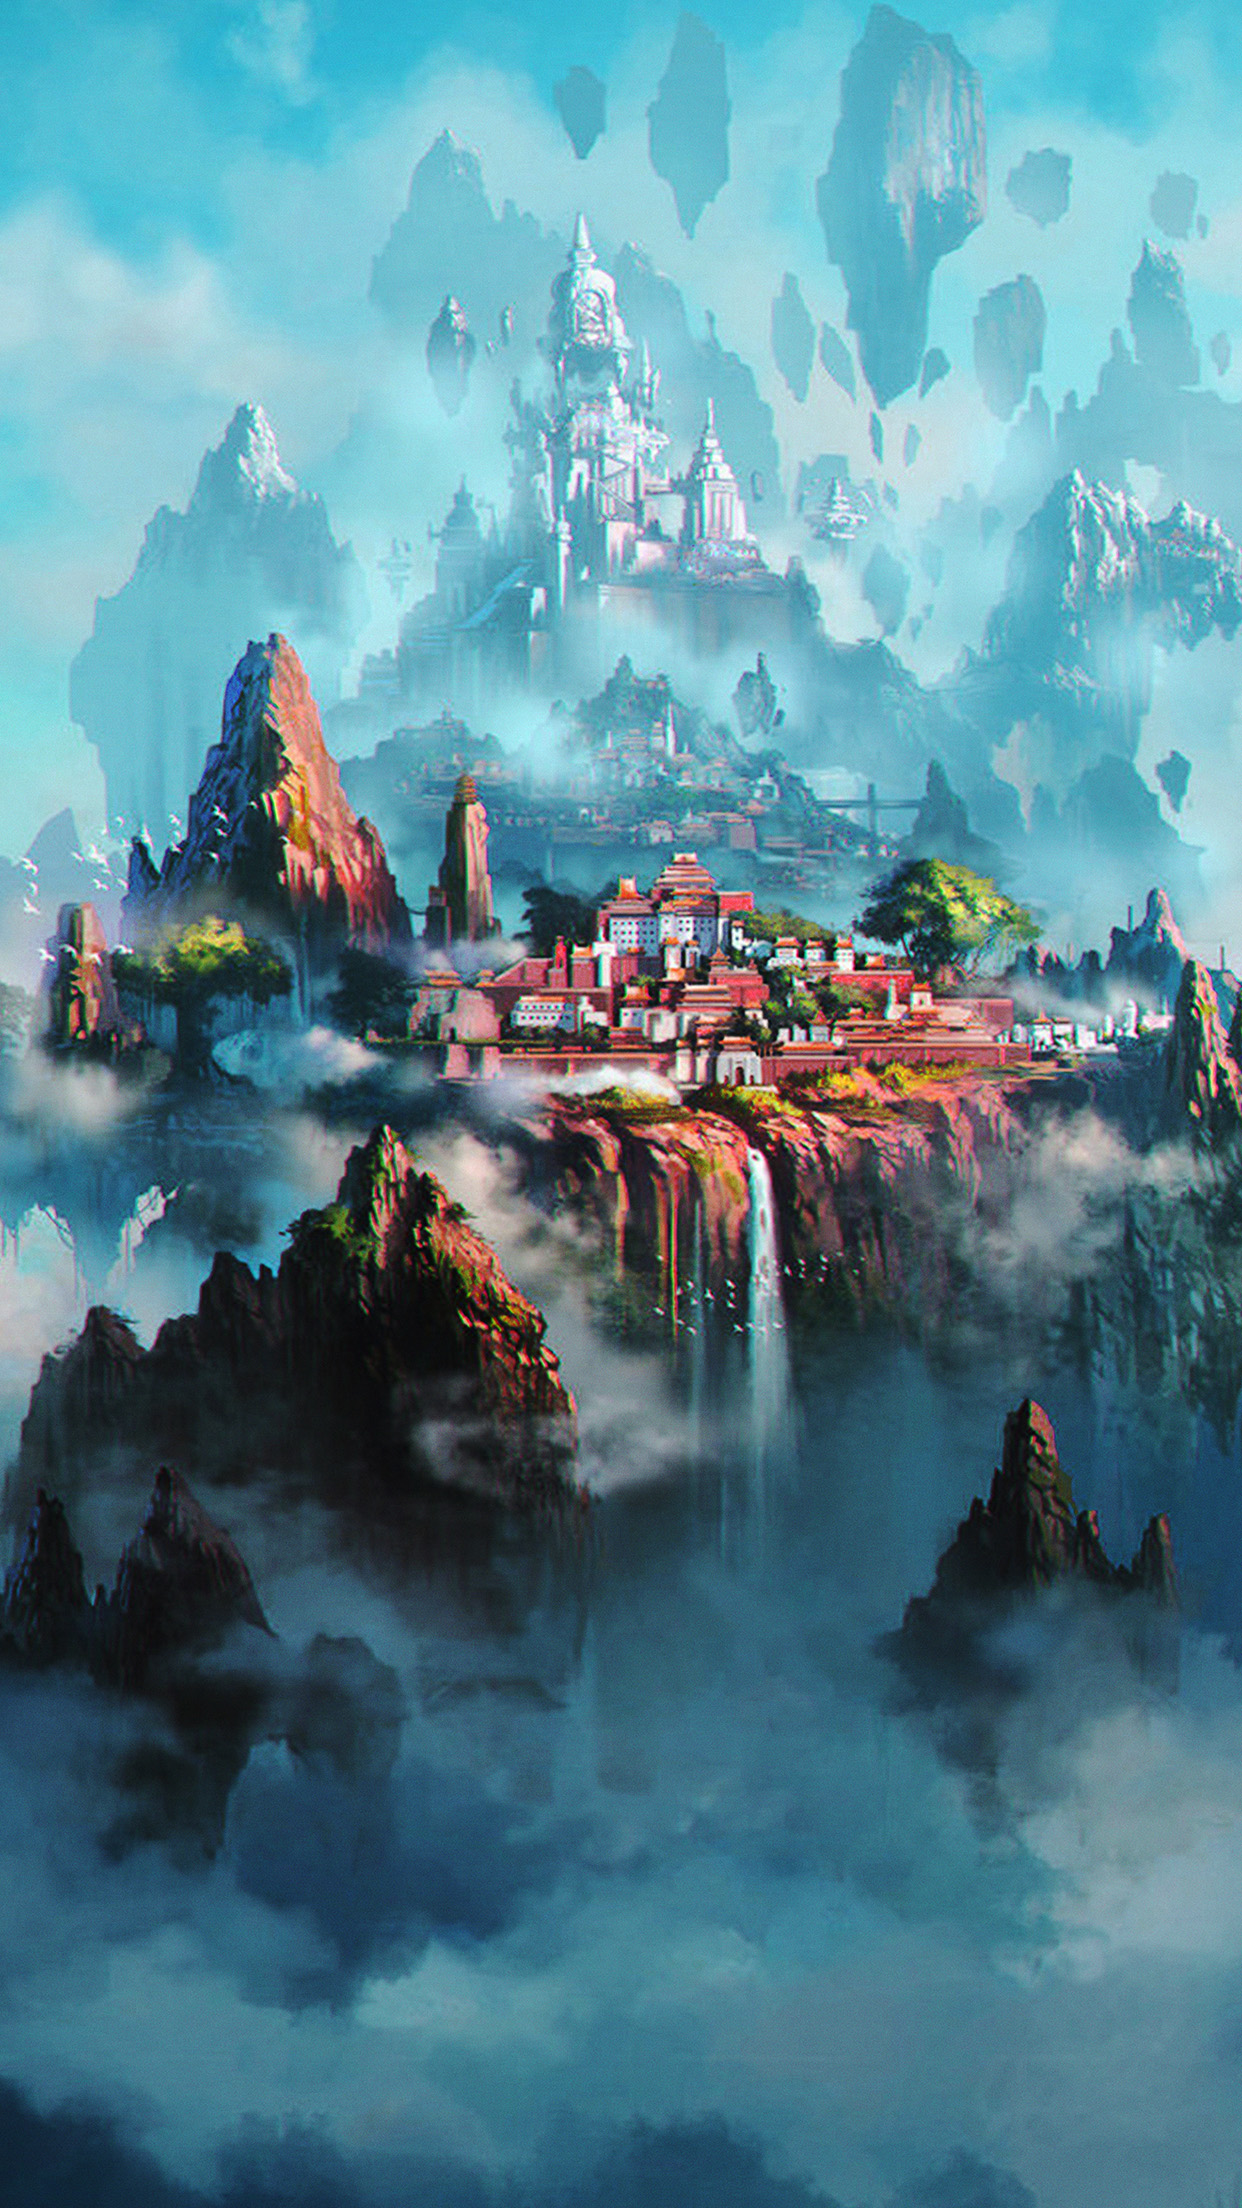 Av36 Cloud Town Fantasy Anime Liang Xing Illustration Art